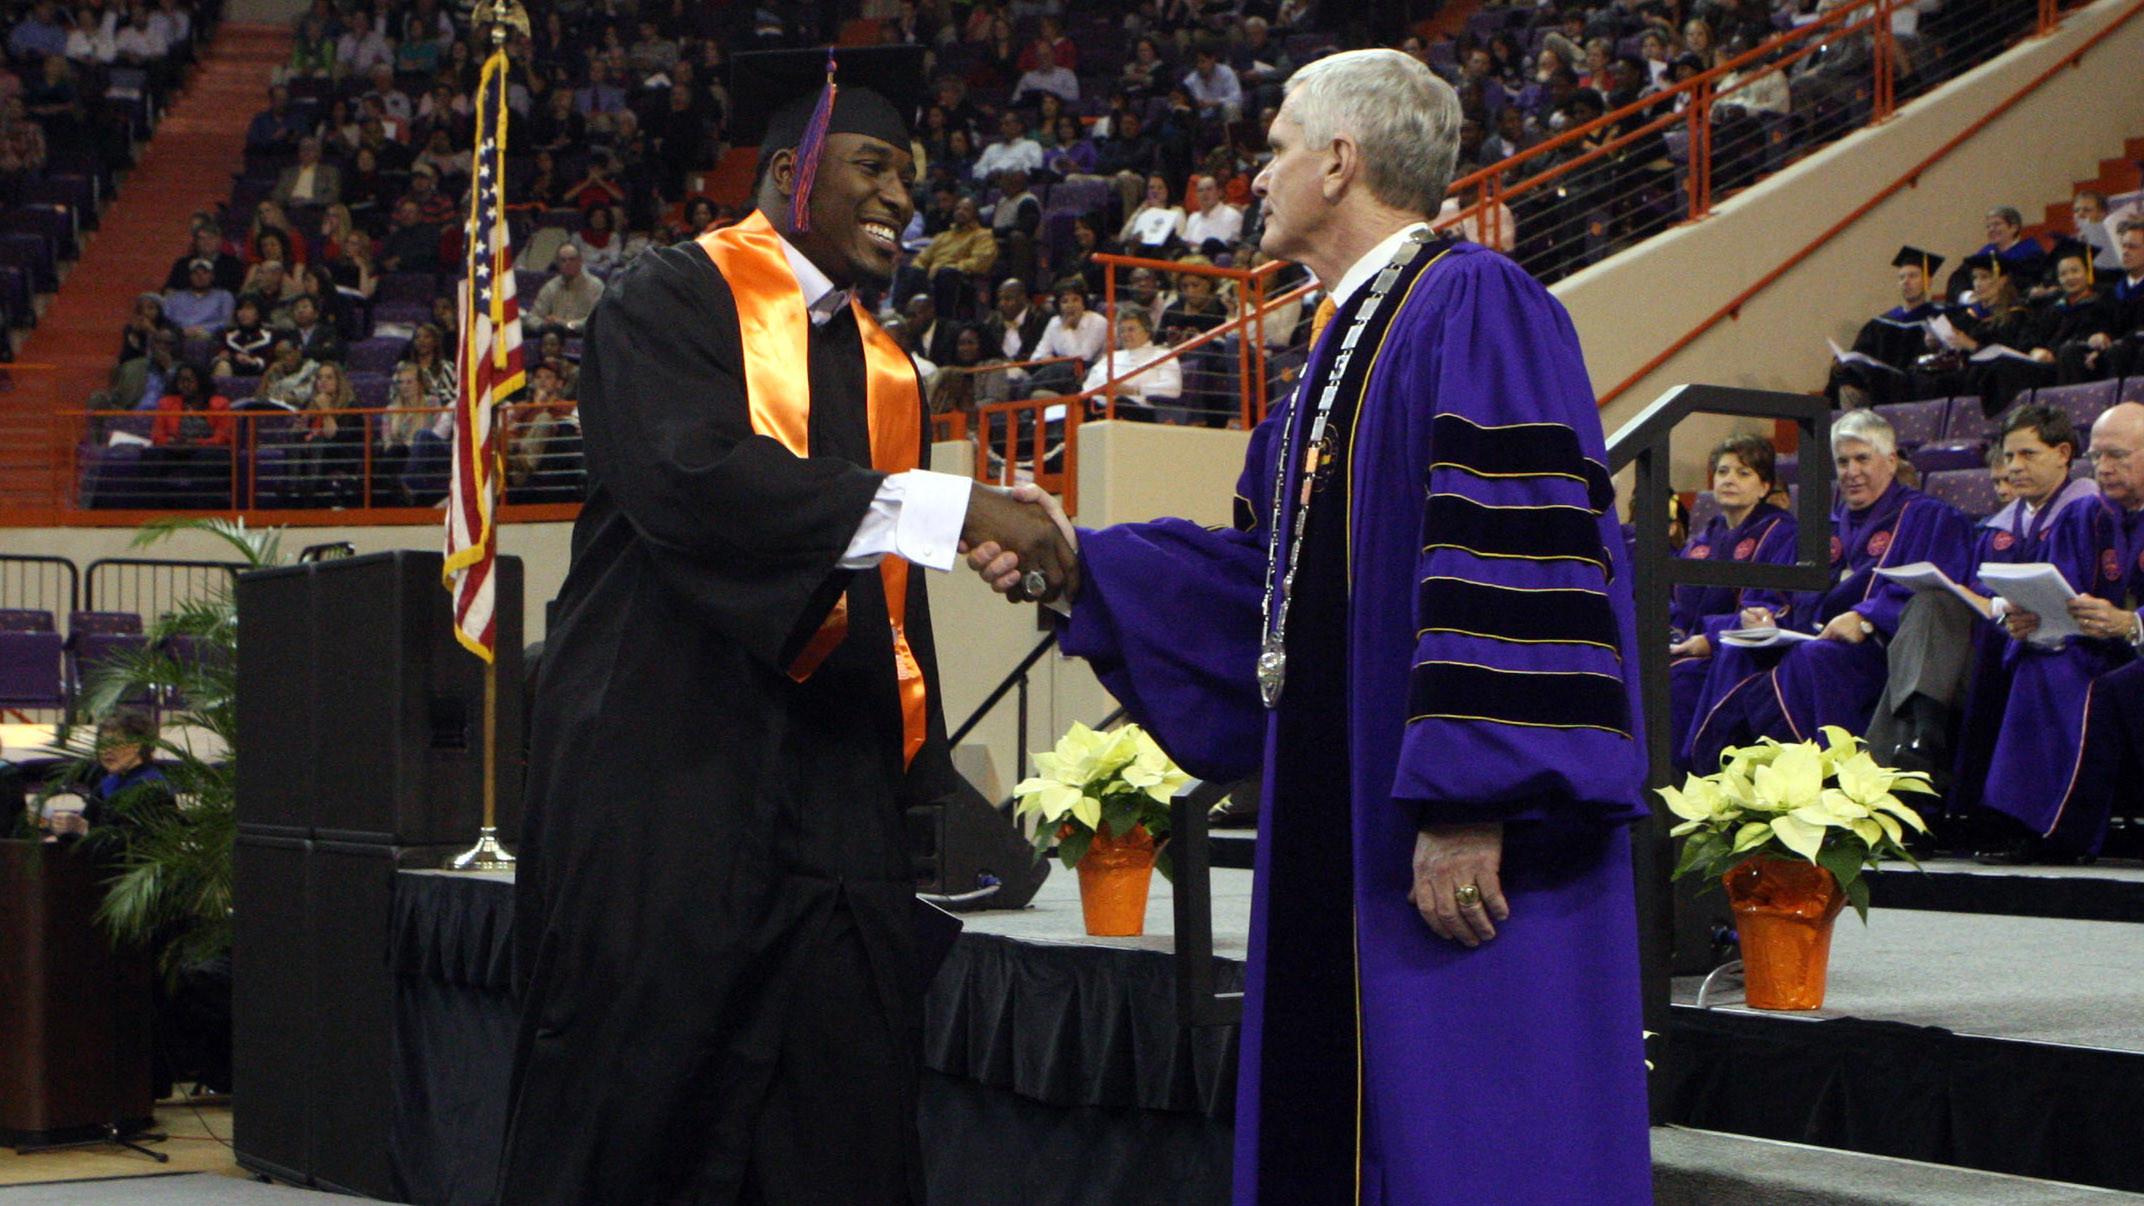 Twenty-Three Clemson Student-Athletes Receive Degrees